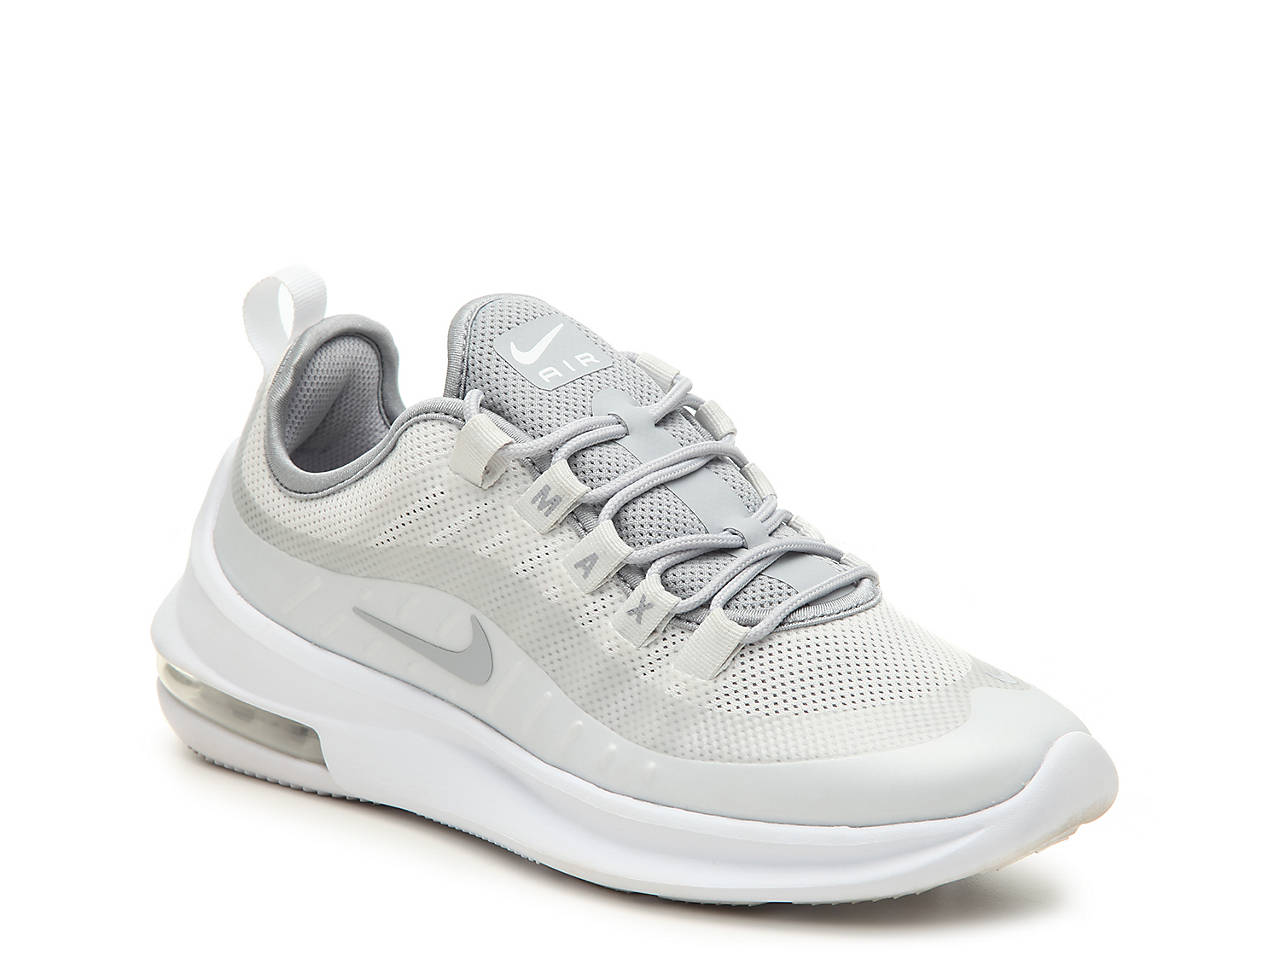 best sneakers a8b3f bffbb Air Max Axis Sneaker - Women s